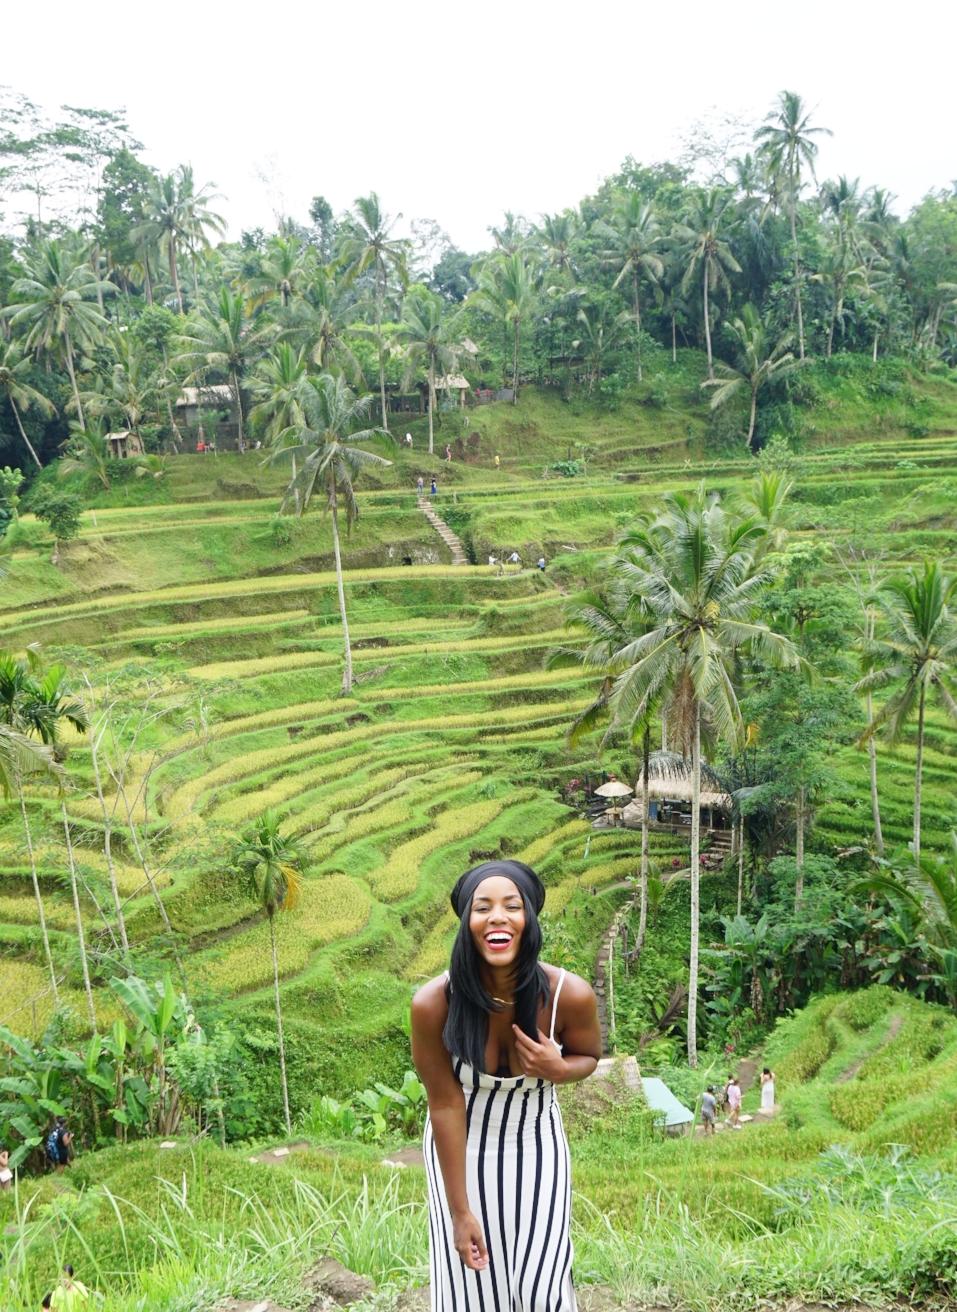 Tegalalang Rice Terrace - Bali, Indonesia